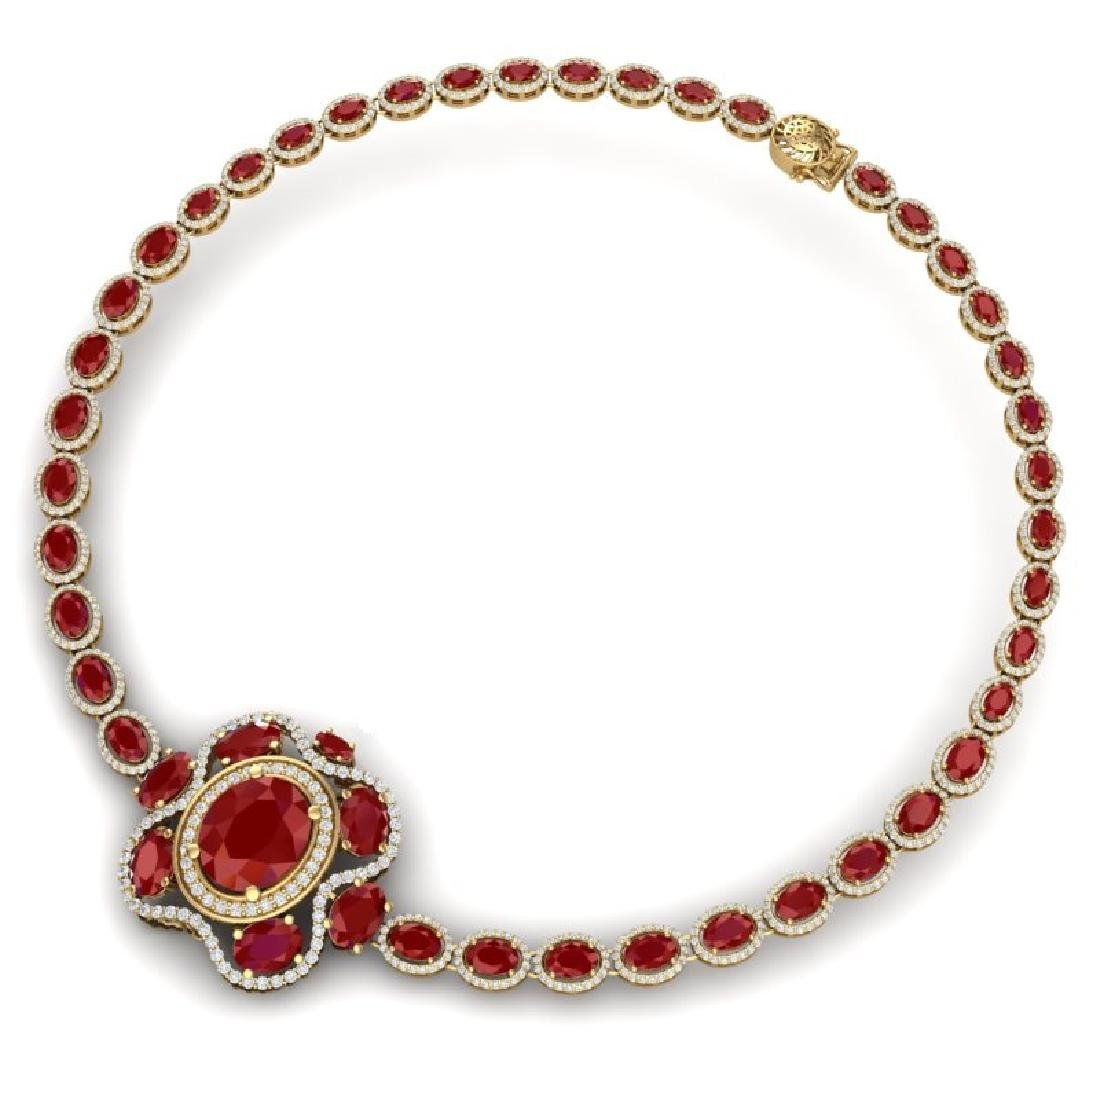 47.43 CTW Royalty Ruby & VS Diamond Necklace 18K Yellow - 3